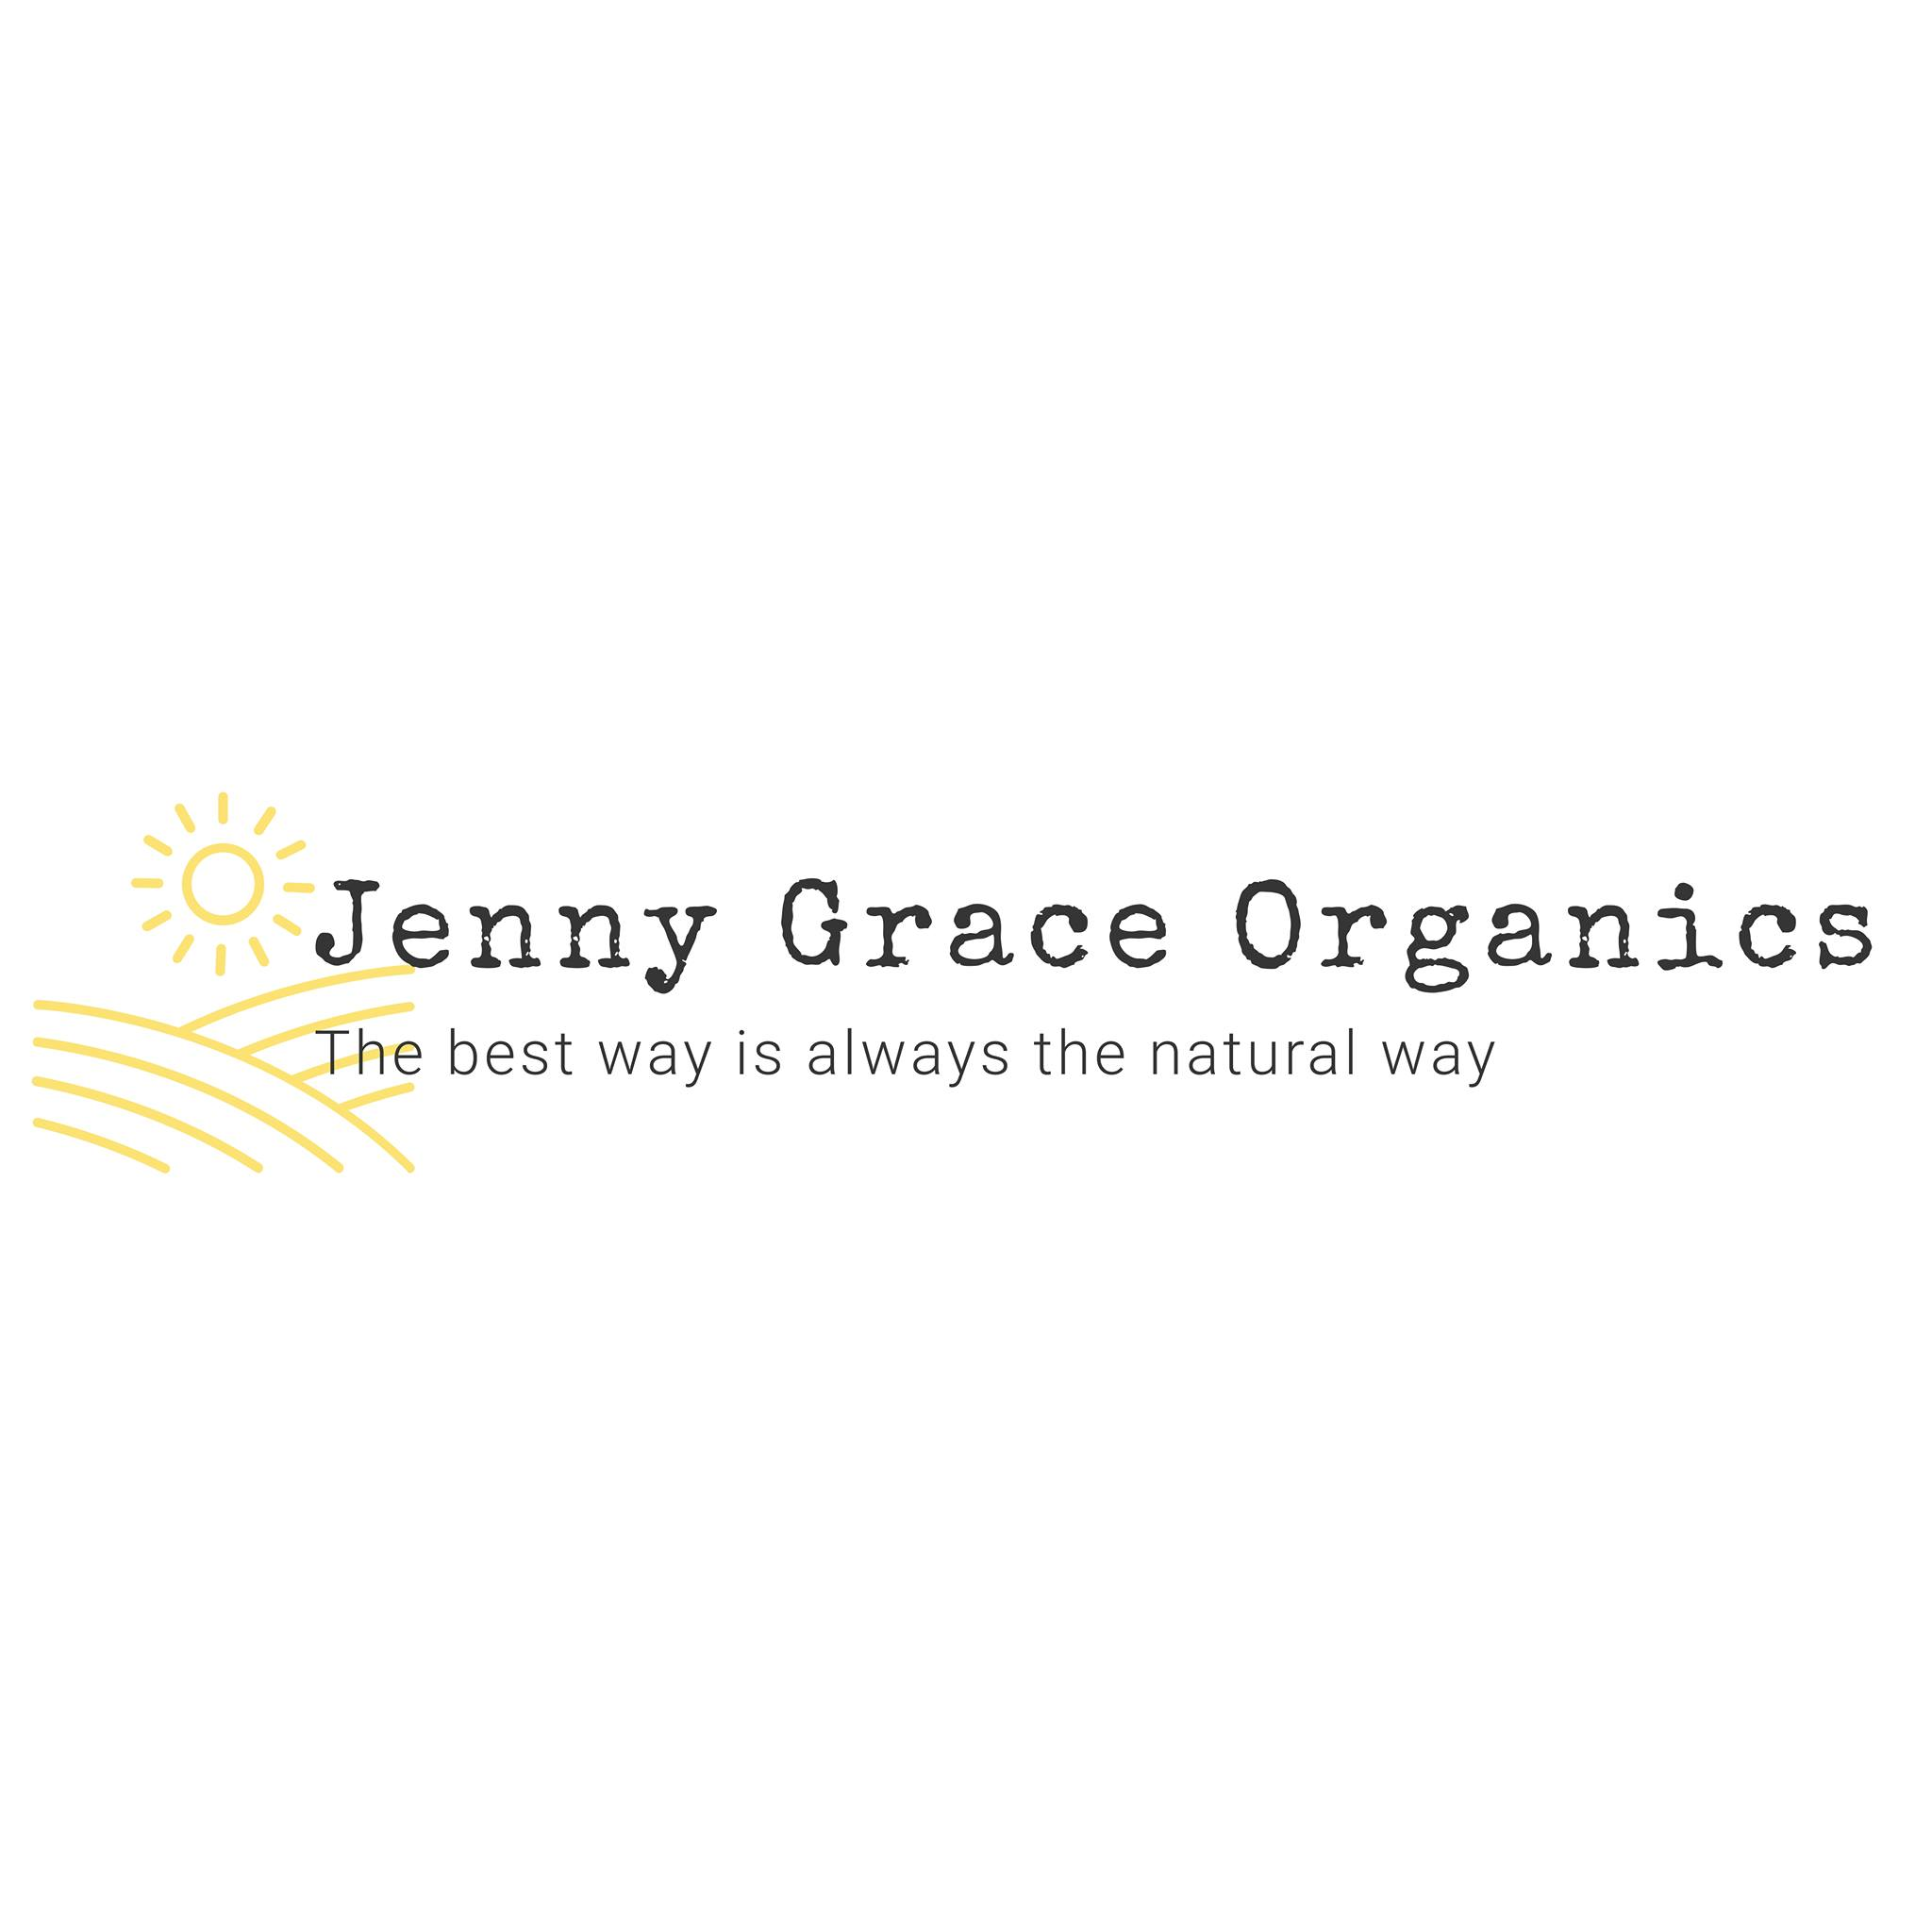 Jenny Grace Organics, LLC